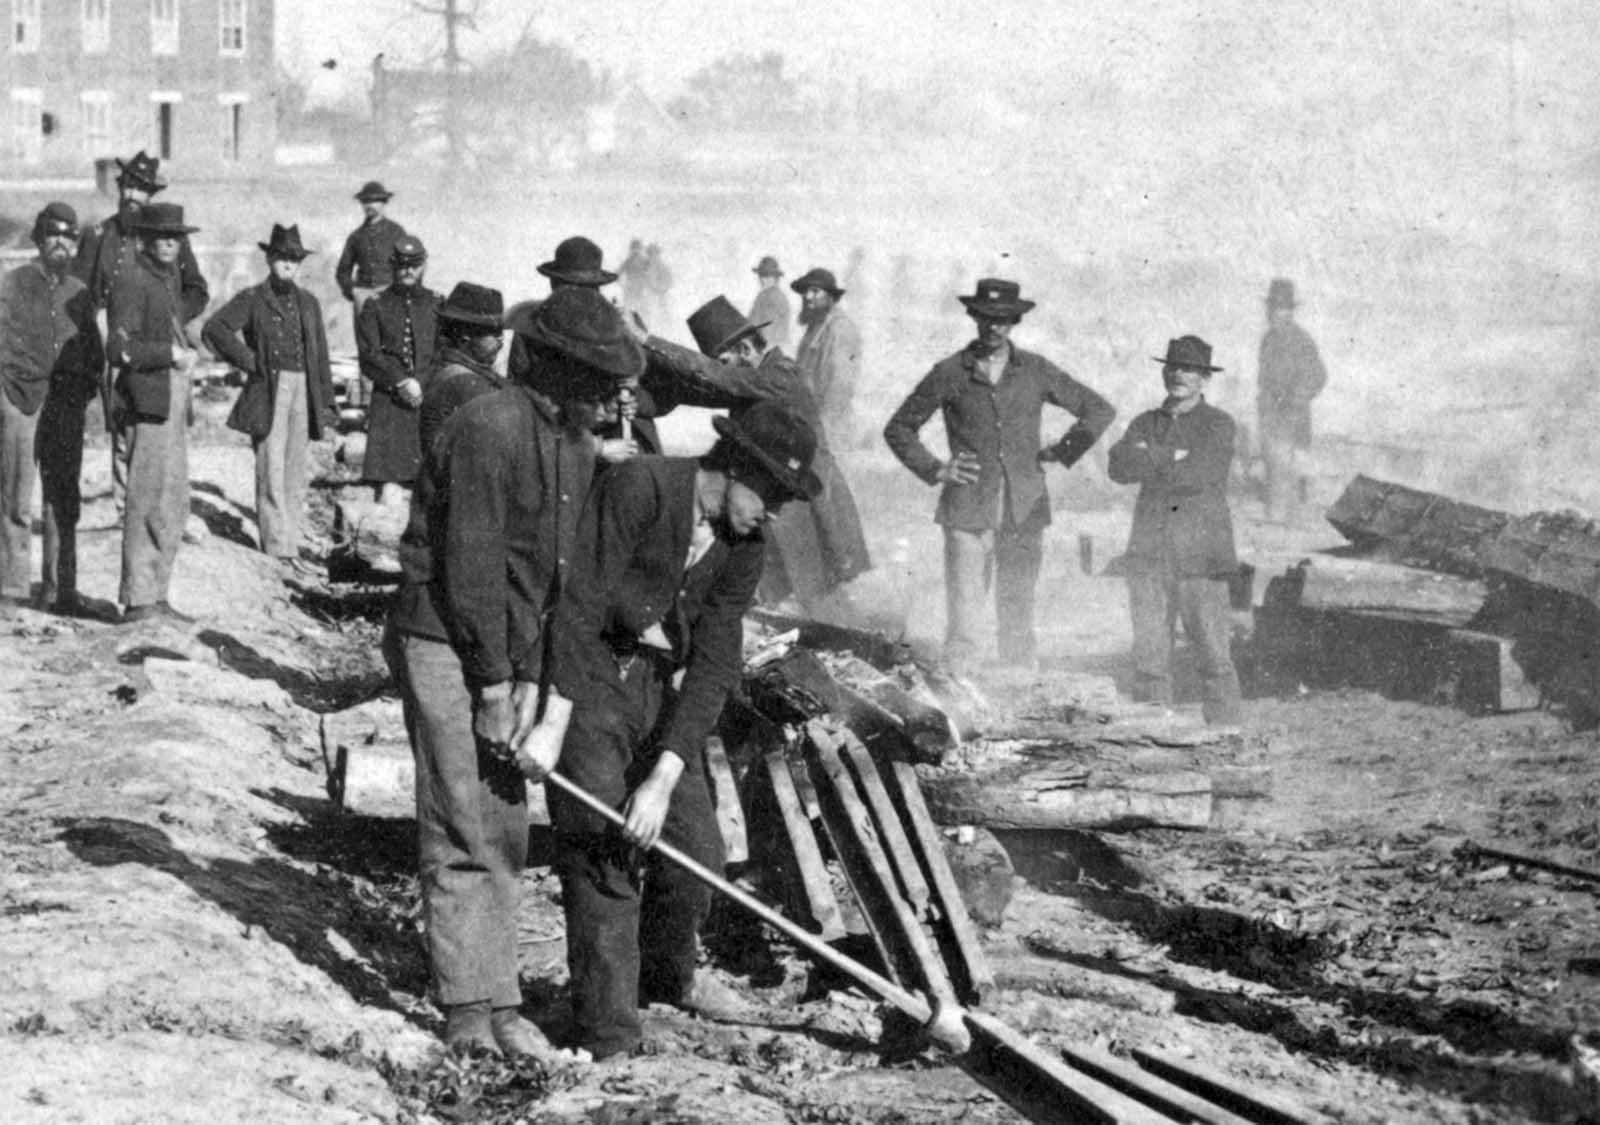 General Sherman's men destroying the railroad before the evacuation of Atlanta, Georgia in 1864.